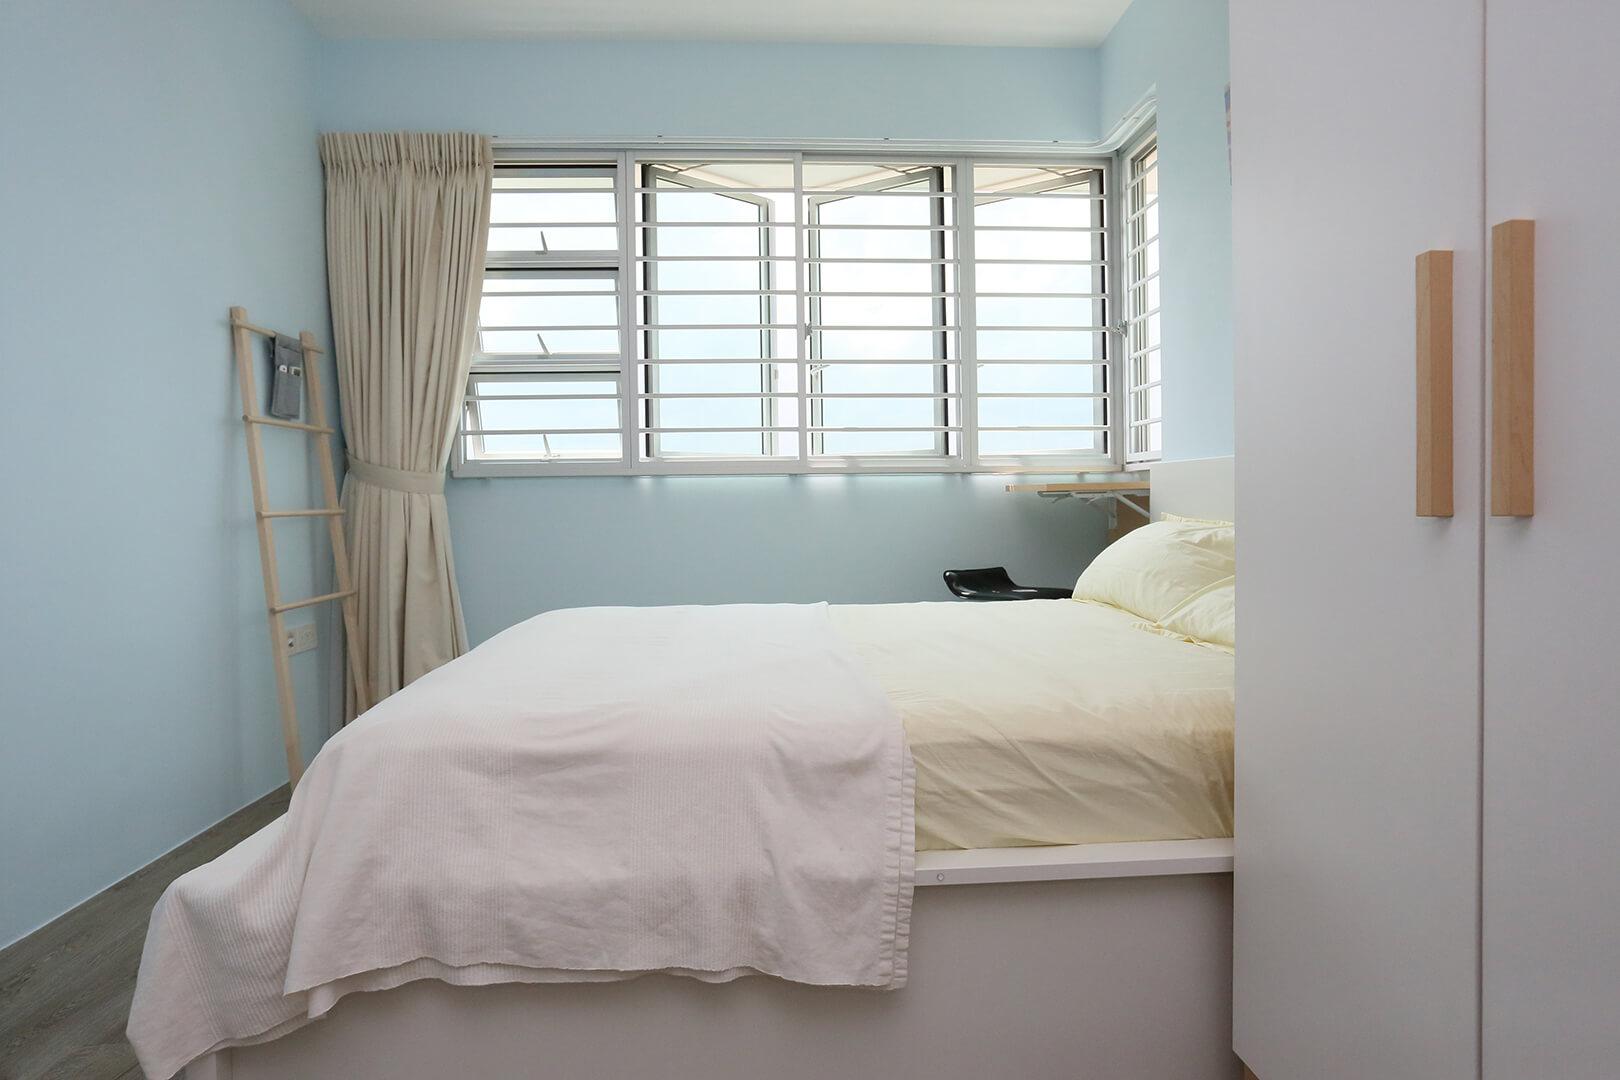 Scandinavian Interior Design Singapore Bedroom 2 Full View